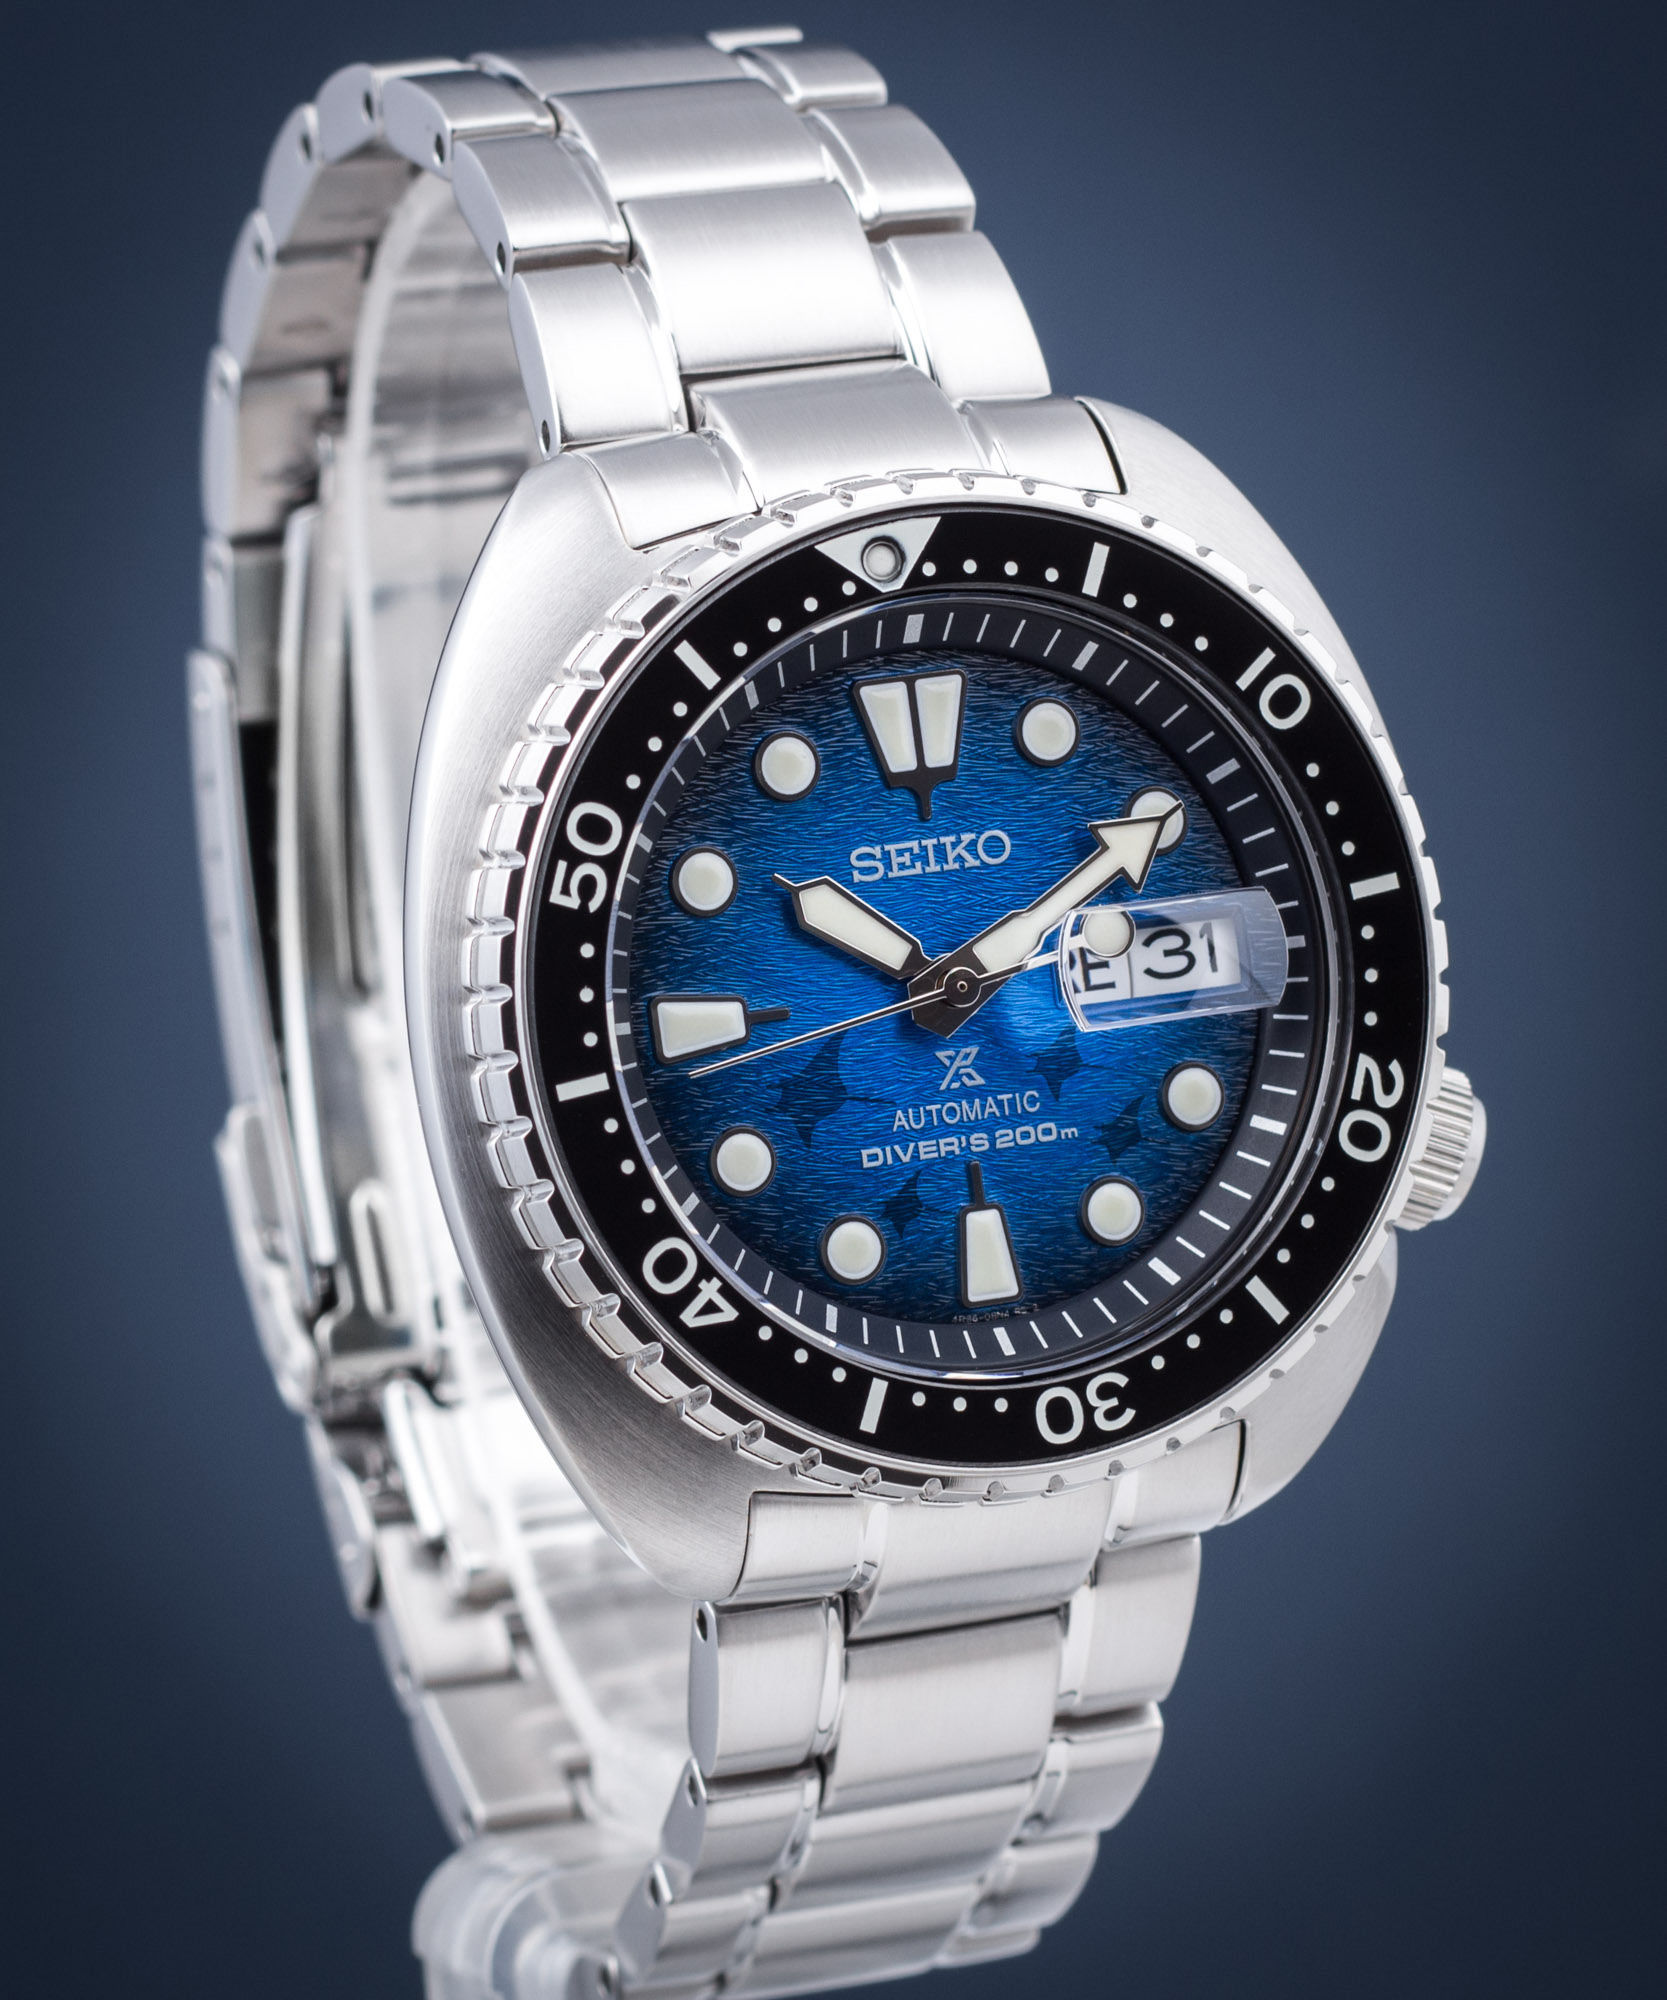 Zegarek męski Seiko Prospex Diver''s King Turtle Save The Ocean Special Edition Automatic